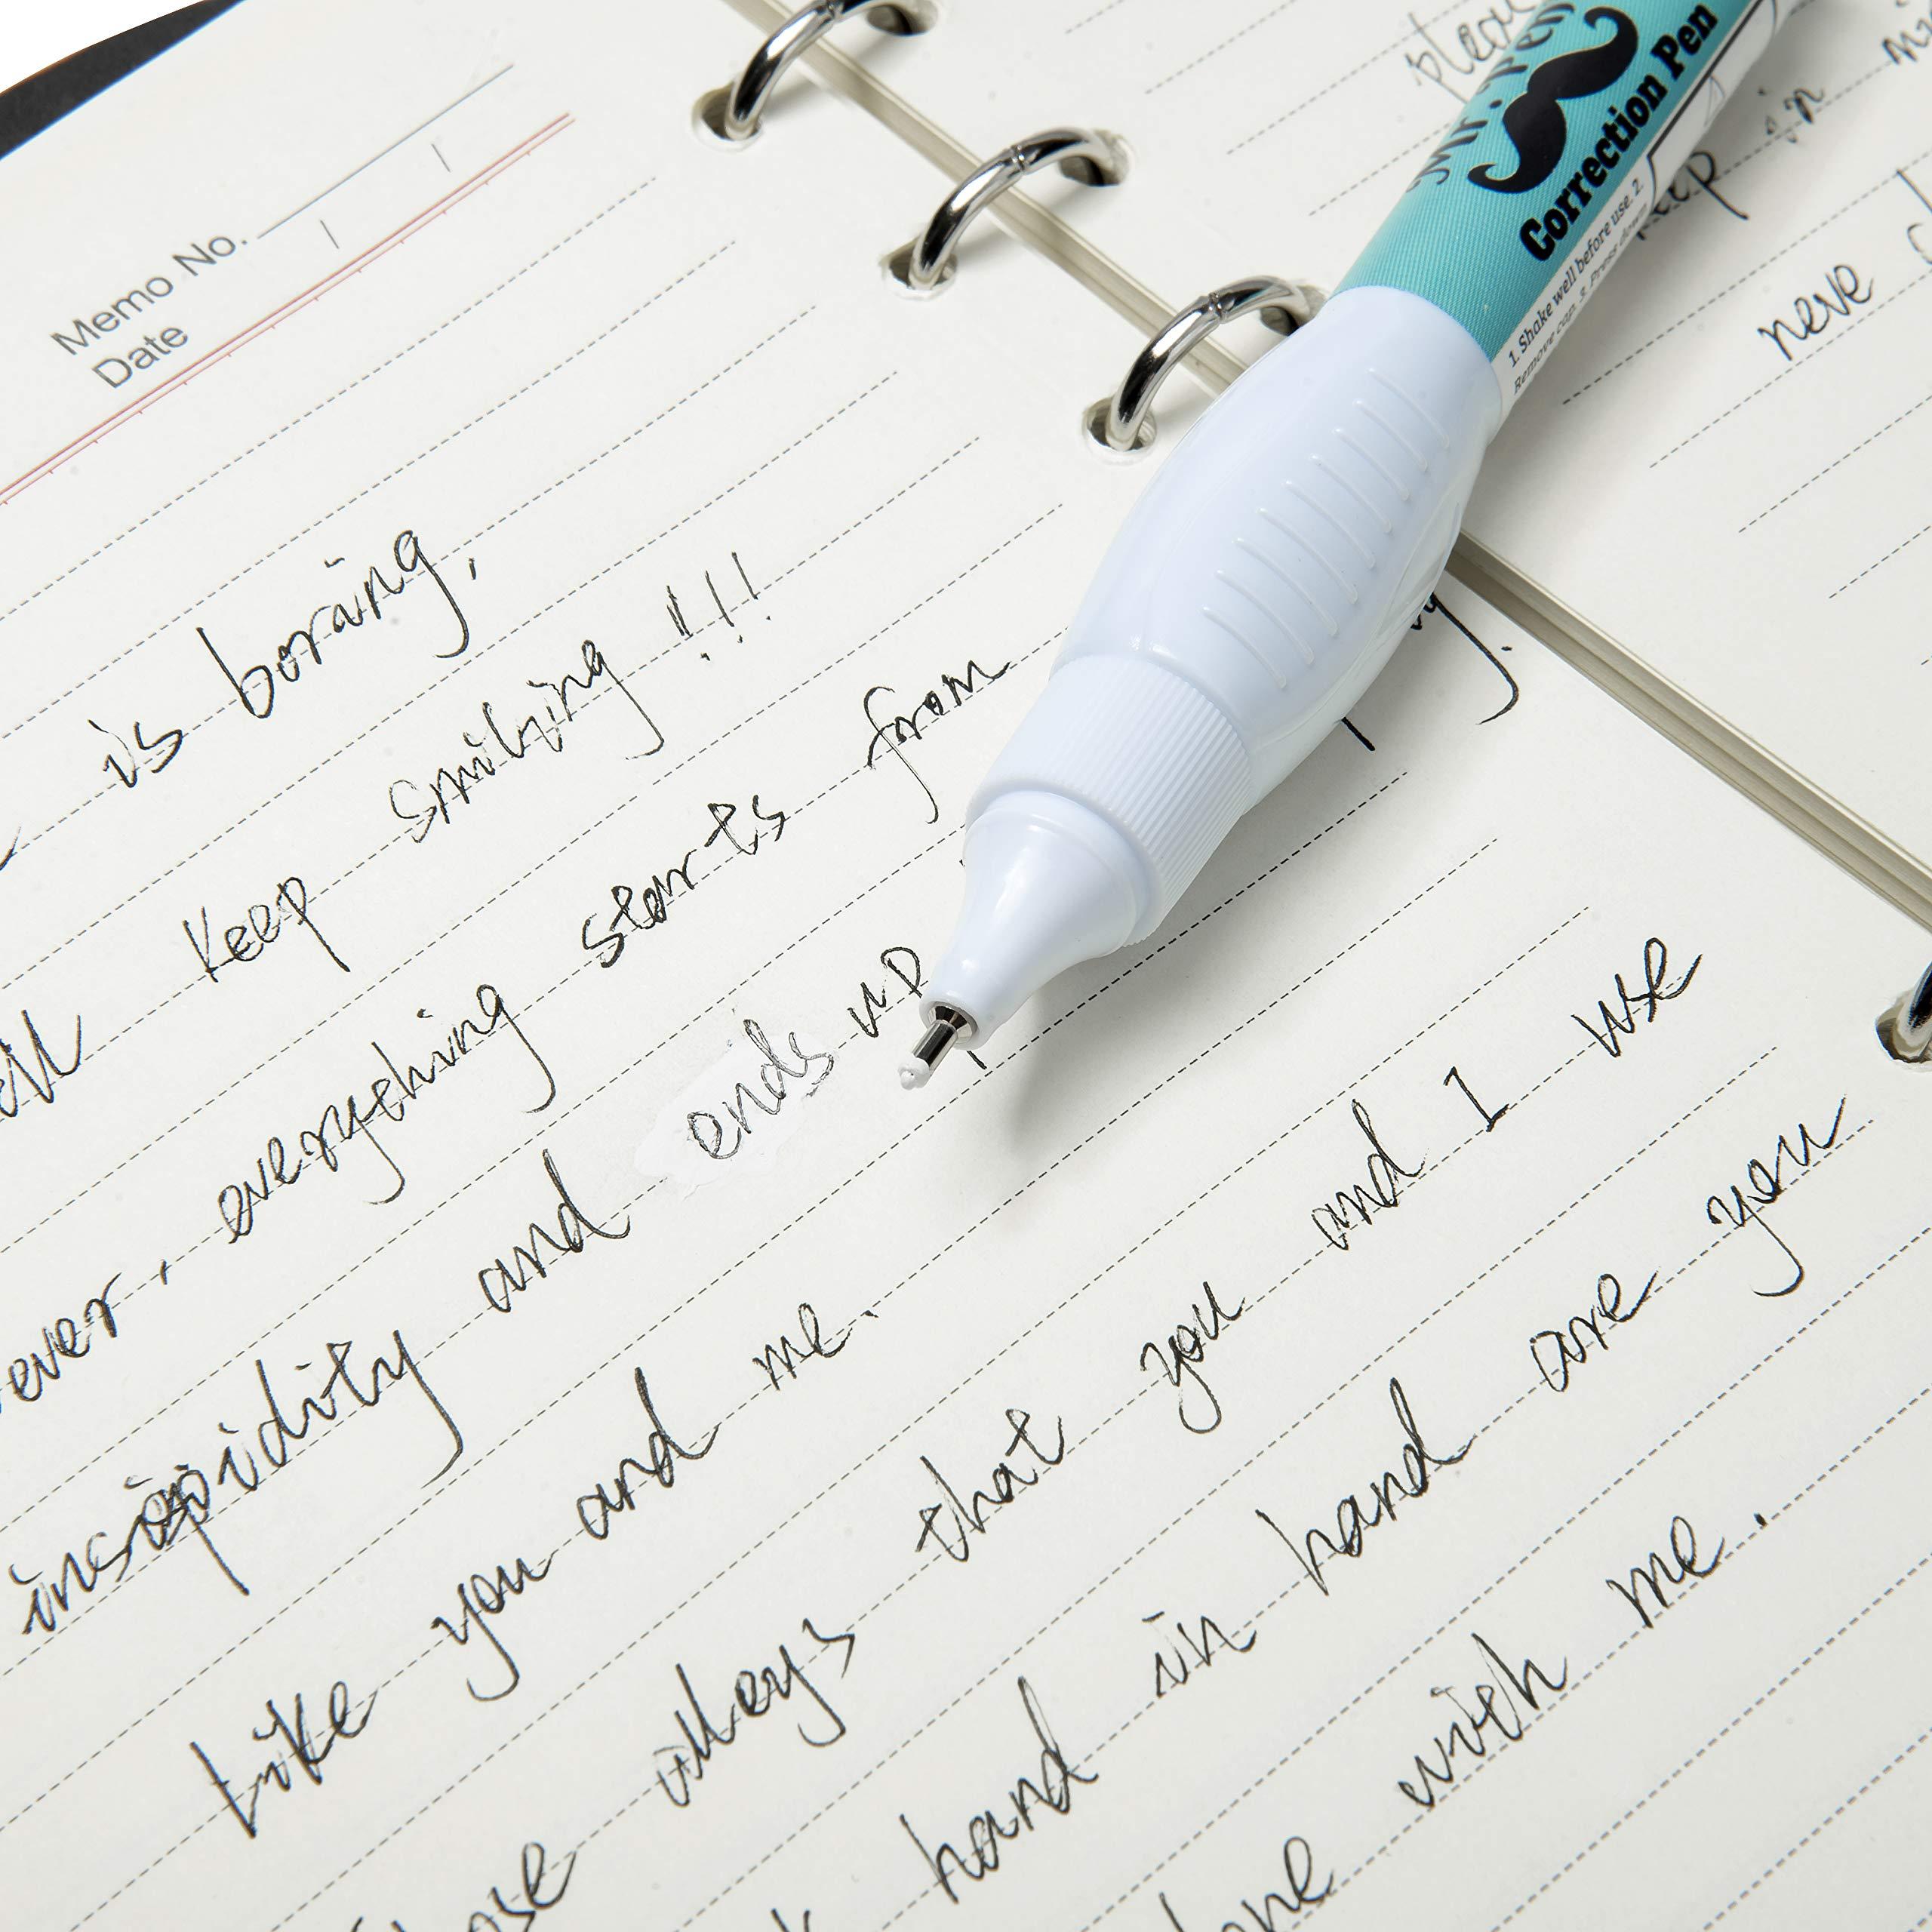 Mr. Pen- Correction Pen, Correction Fluid, Pack of 12, Correction liquid White, White Correction Fluid, White Fluid, White Out, Wipe Out Liquid, Wide Out Fluid, White Correction Tape Pen Fluid by Mr. Pen (Image #5)